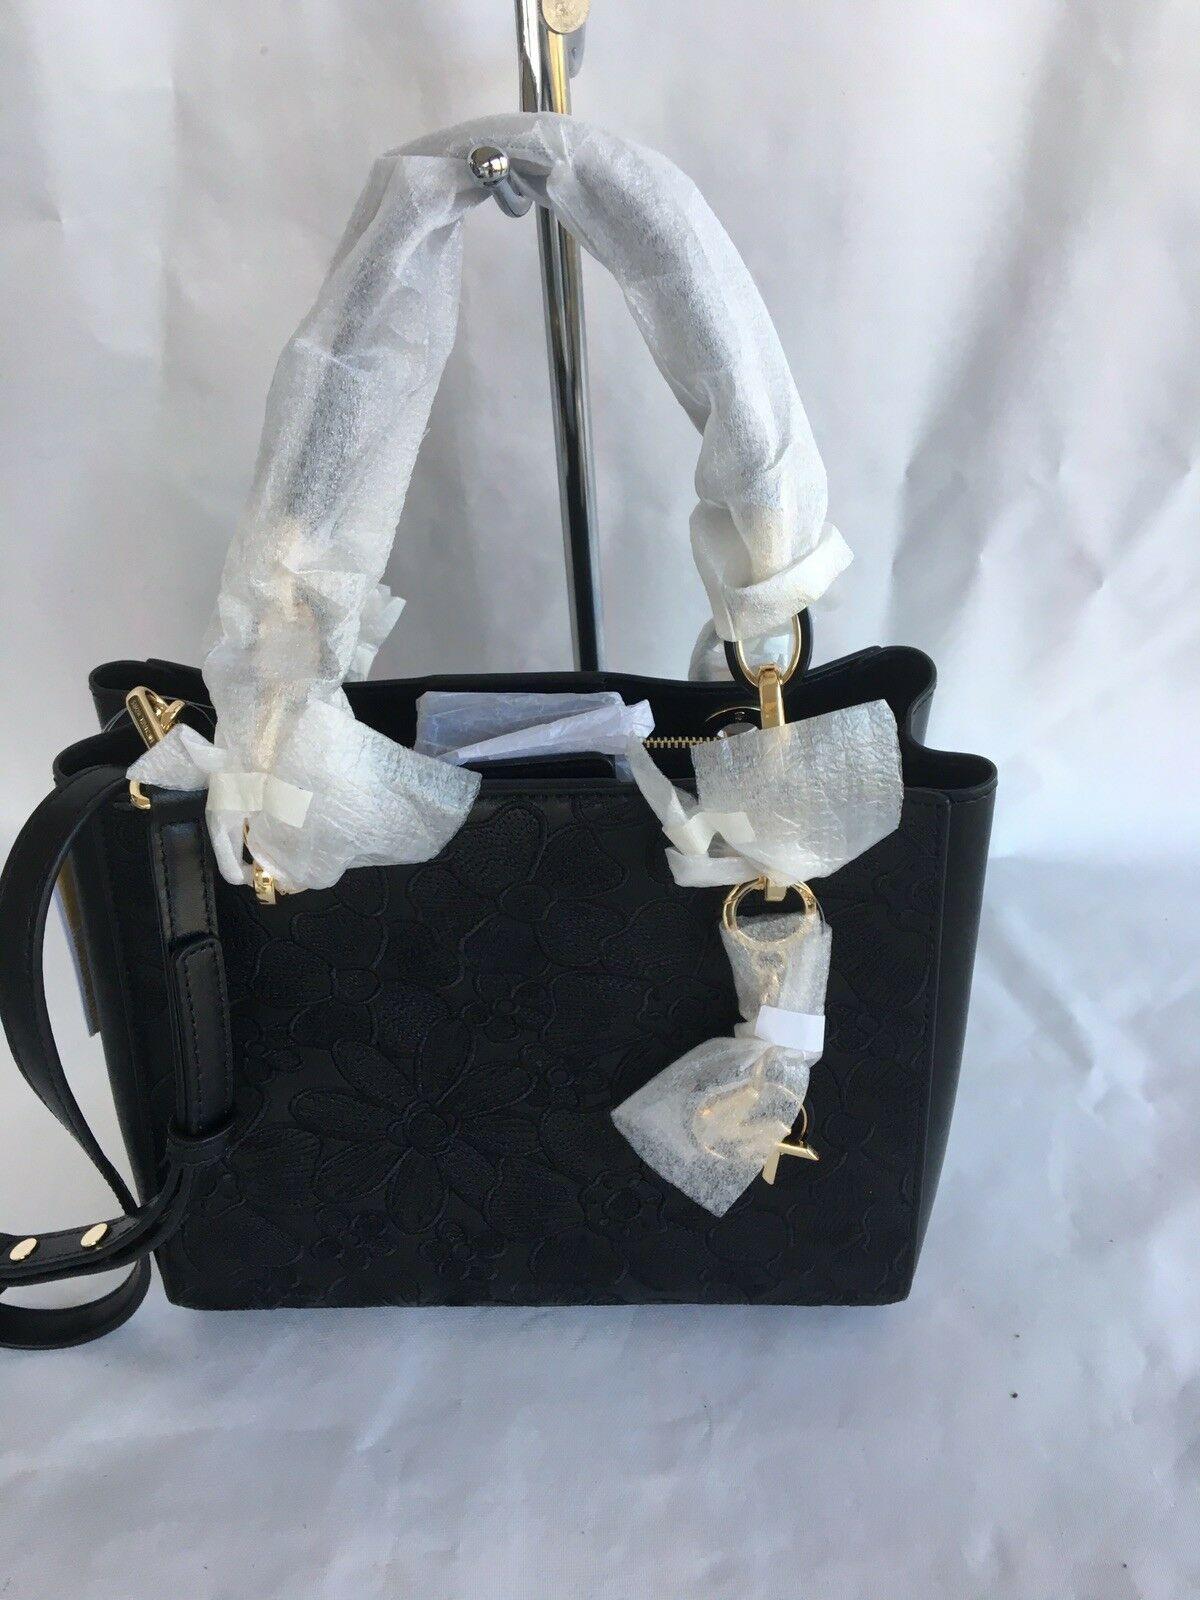 92a92c257370 Michael Kors Cynthia Small Dressy Satchel and 13 similar items. S l1600